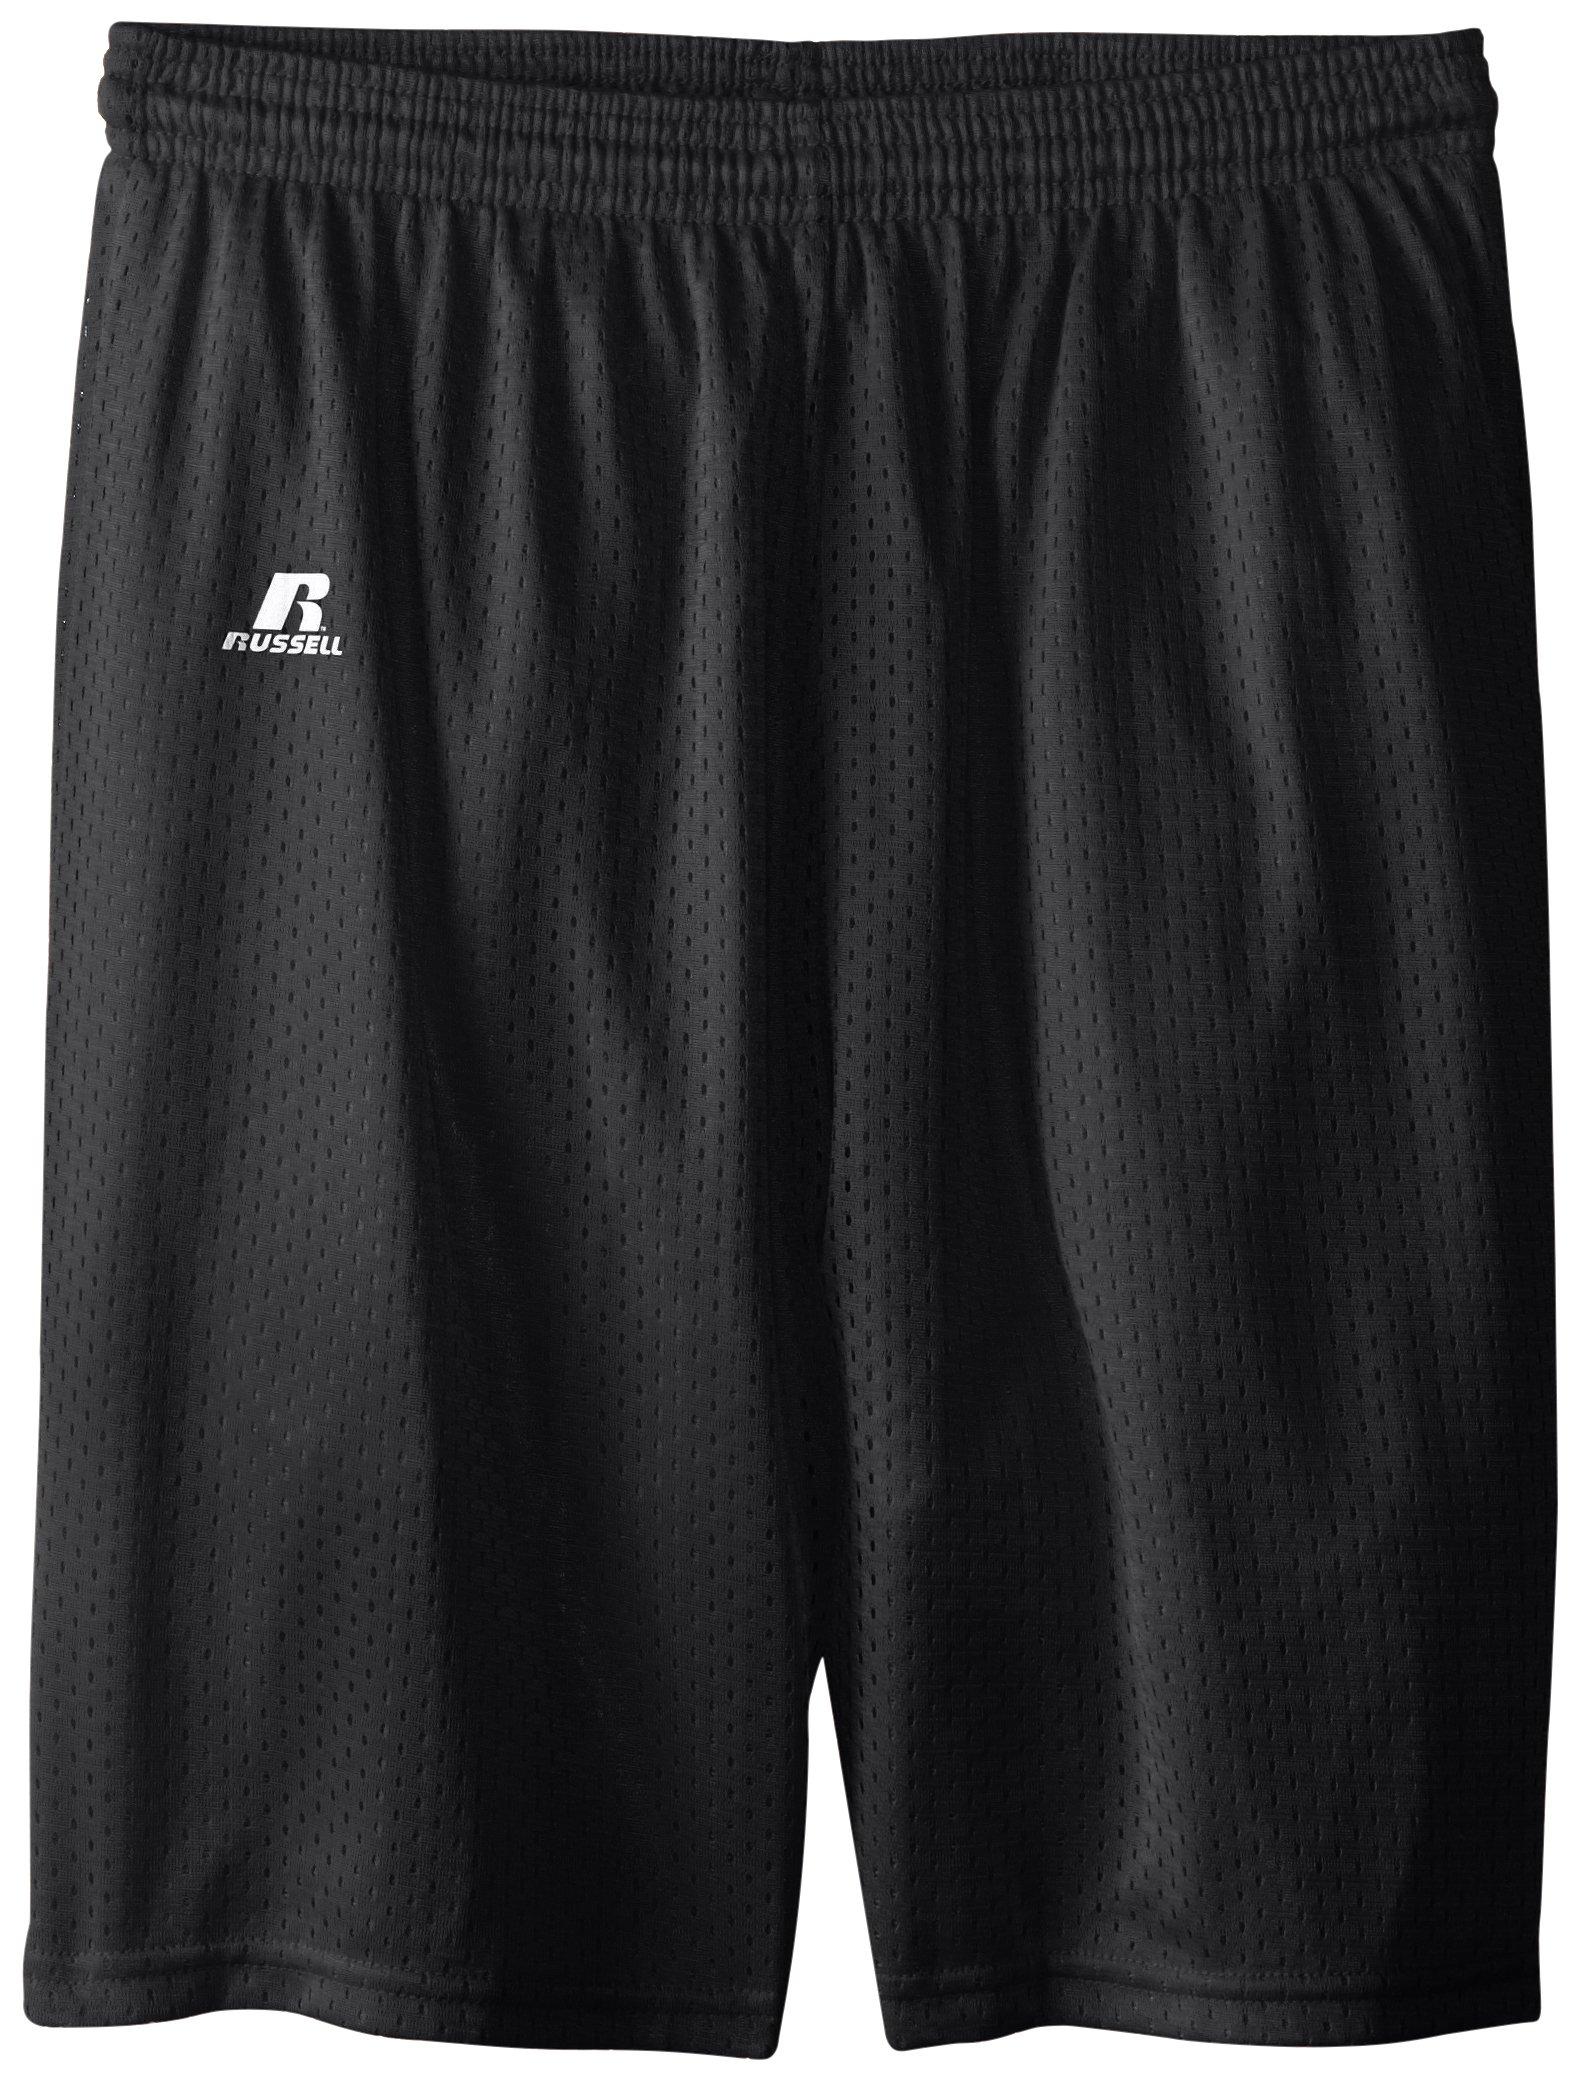 Russell Athletic Big Boys' Youth Mesh Short, Black, Medium